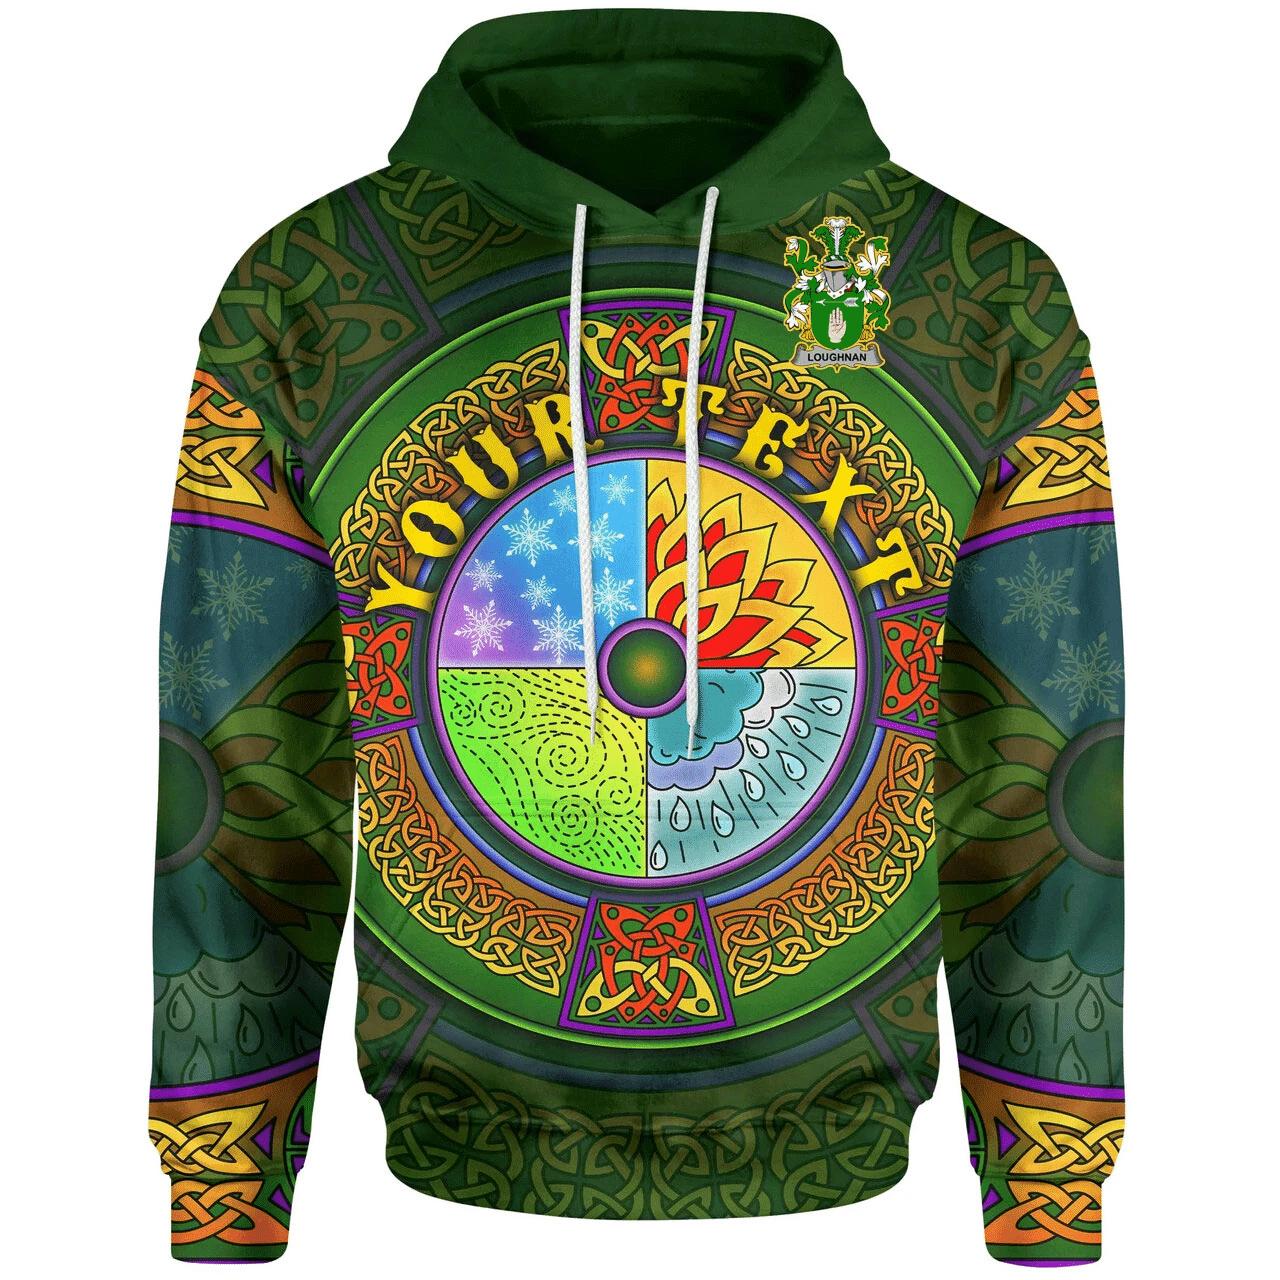 (Custom) 1stIreland Ireland Hoodie - Loughnan or O'Loughnan Irish Family Crest Hoodie - Celtic Element A7